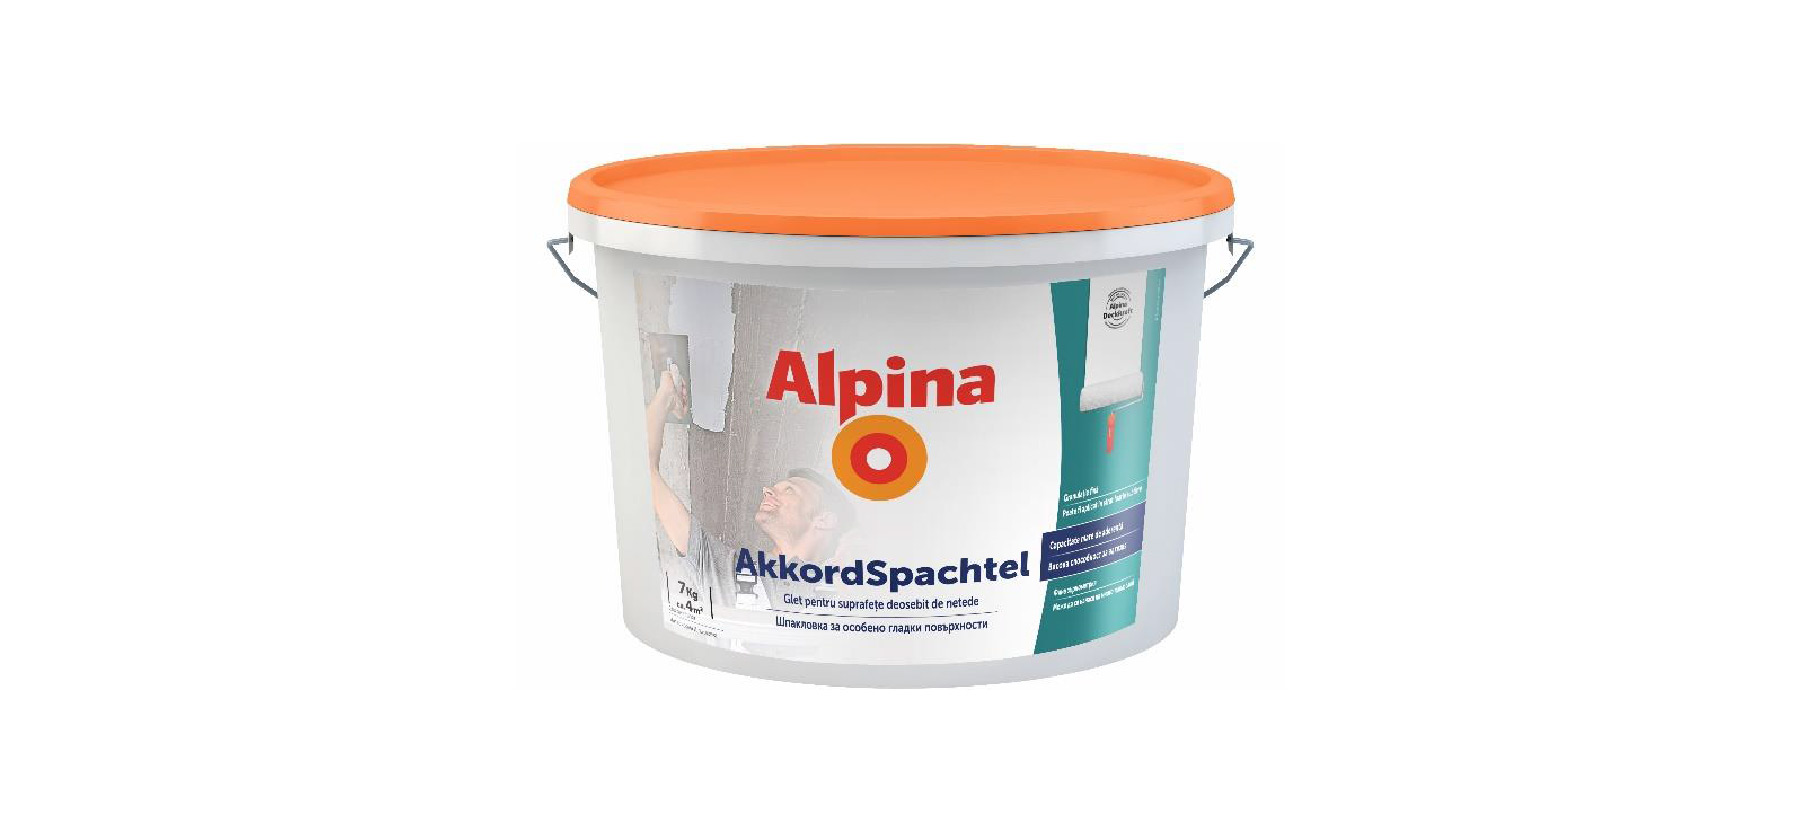 Alpina-AkkordSpachtel